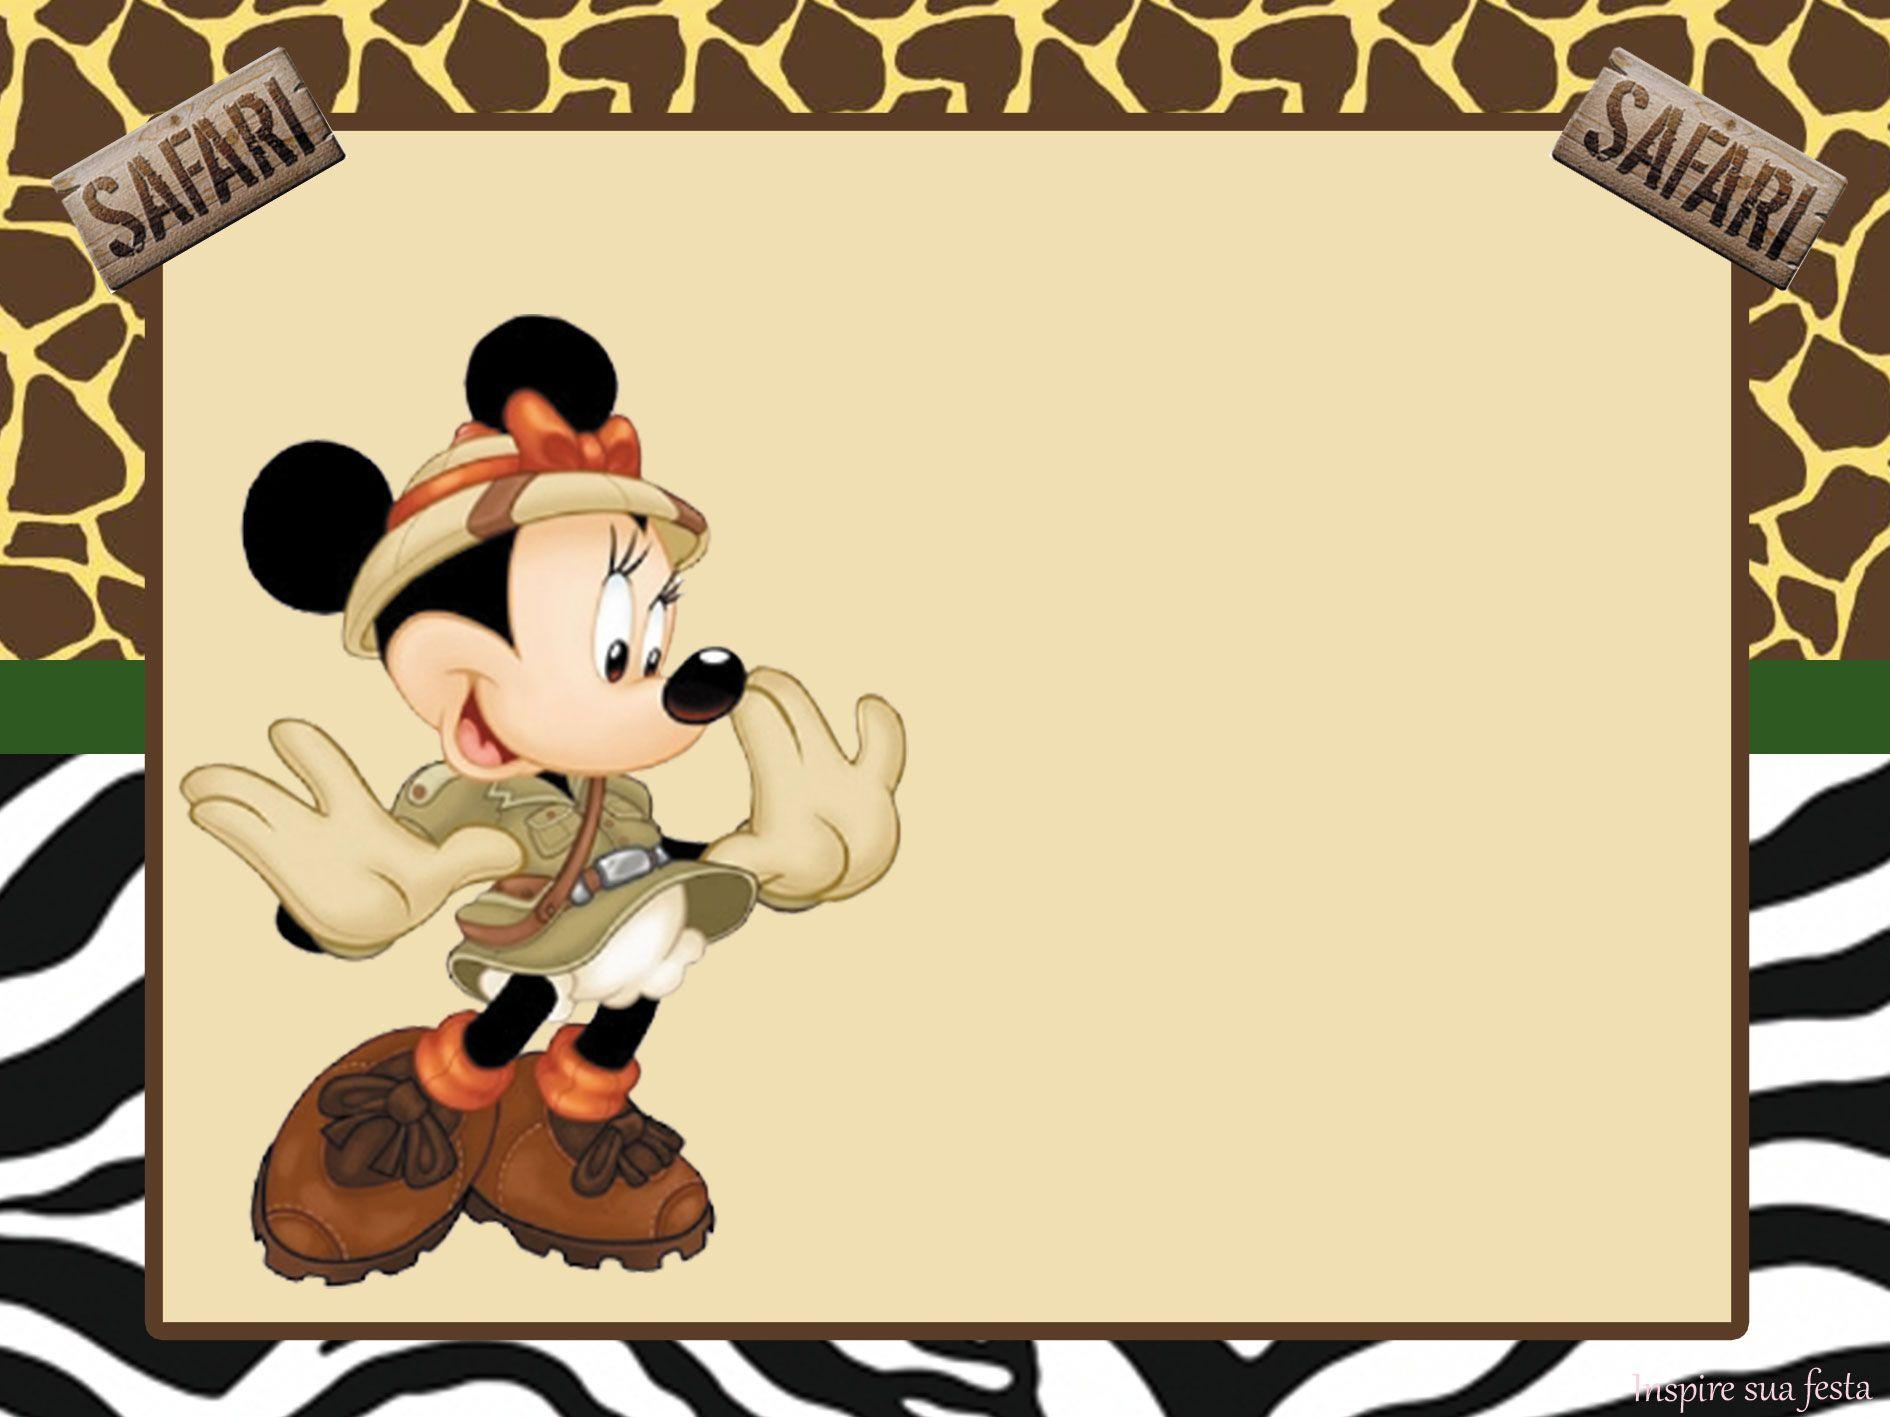 http://inspiresuafesta.com/mickey-e-minnie-safari-kit-digital ...